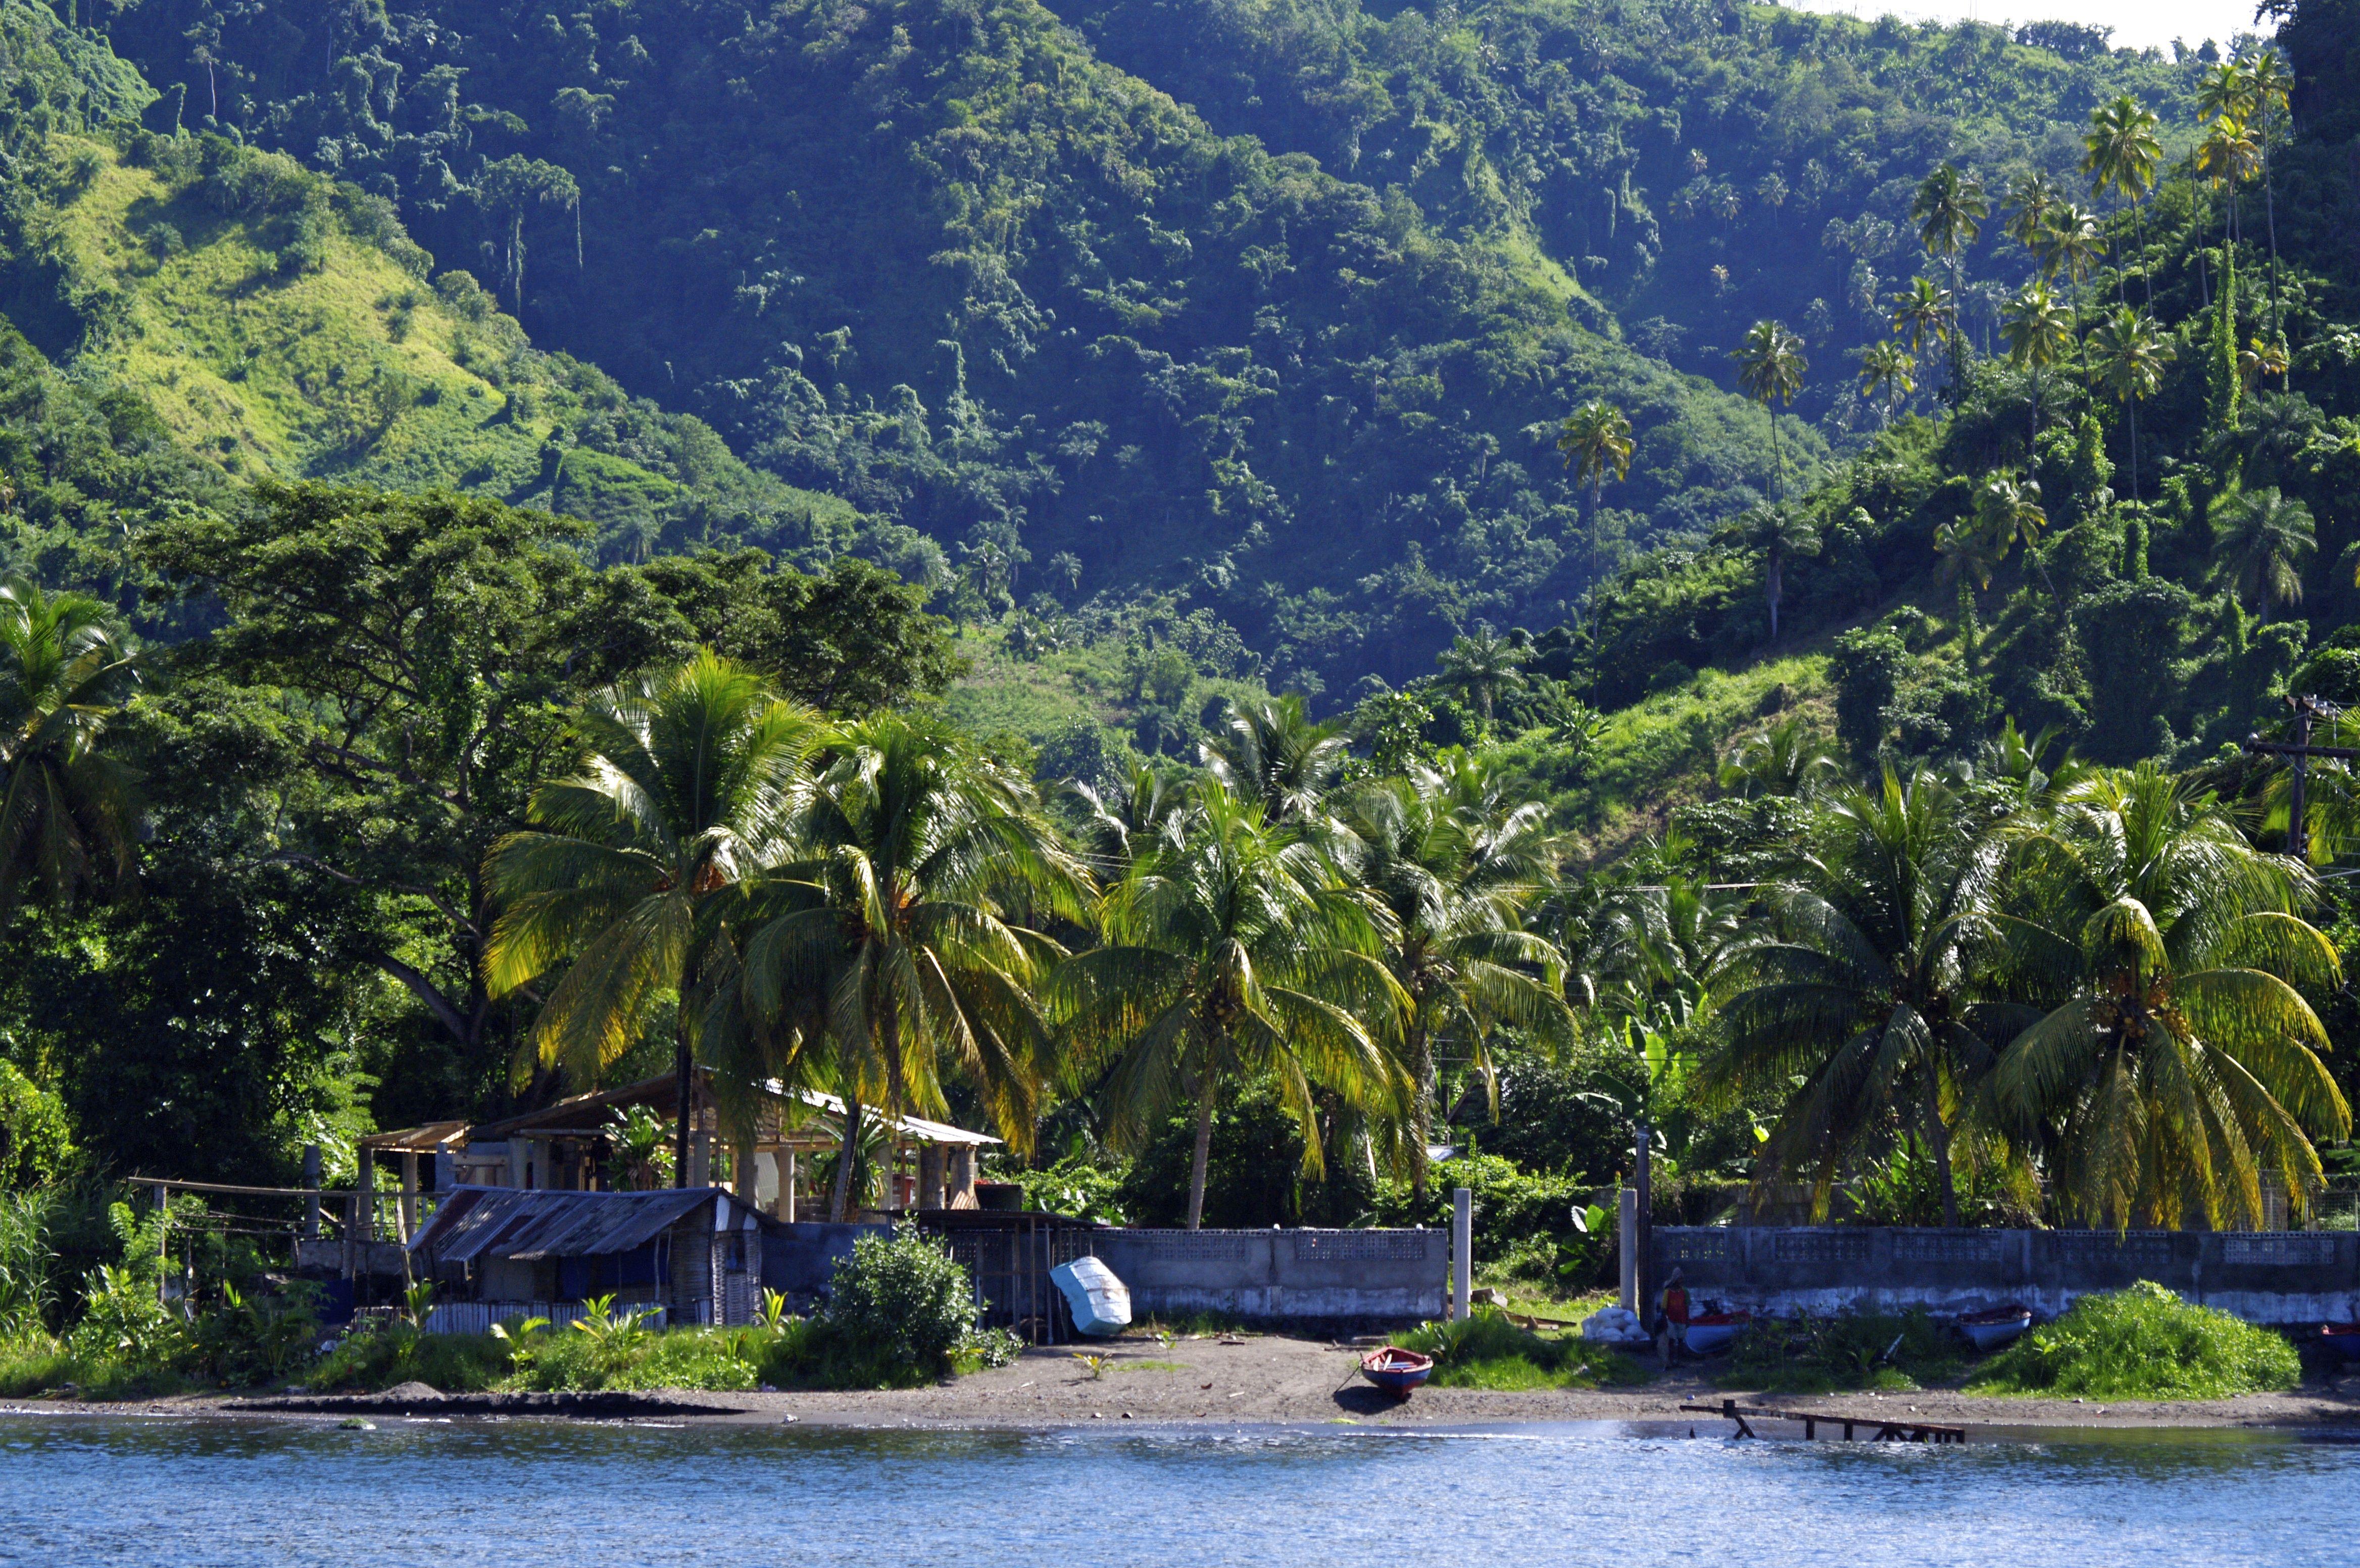 St. Vincent, Photo: Frank Anders | Photo, Caribbean, Tours